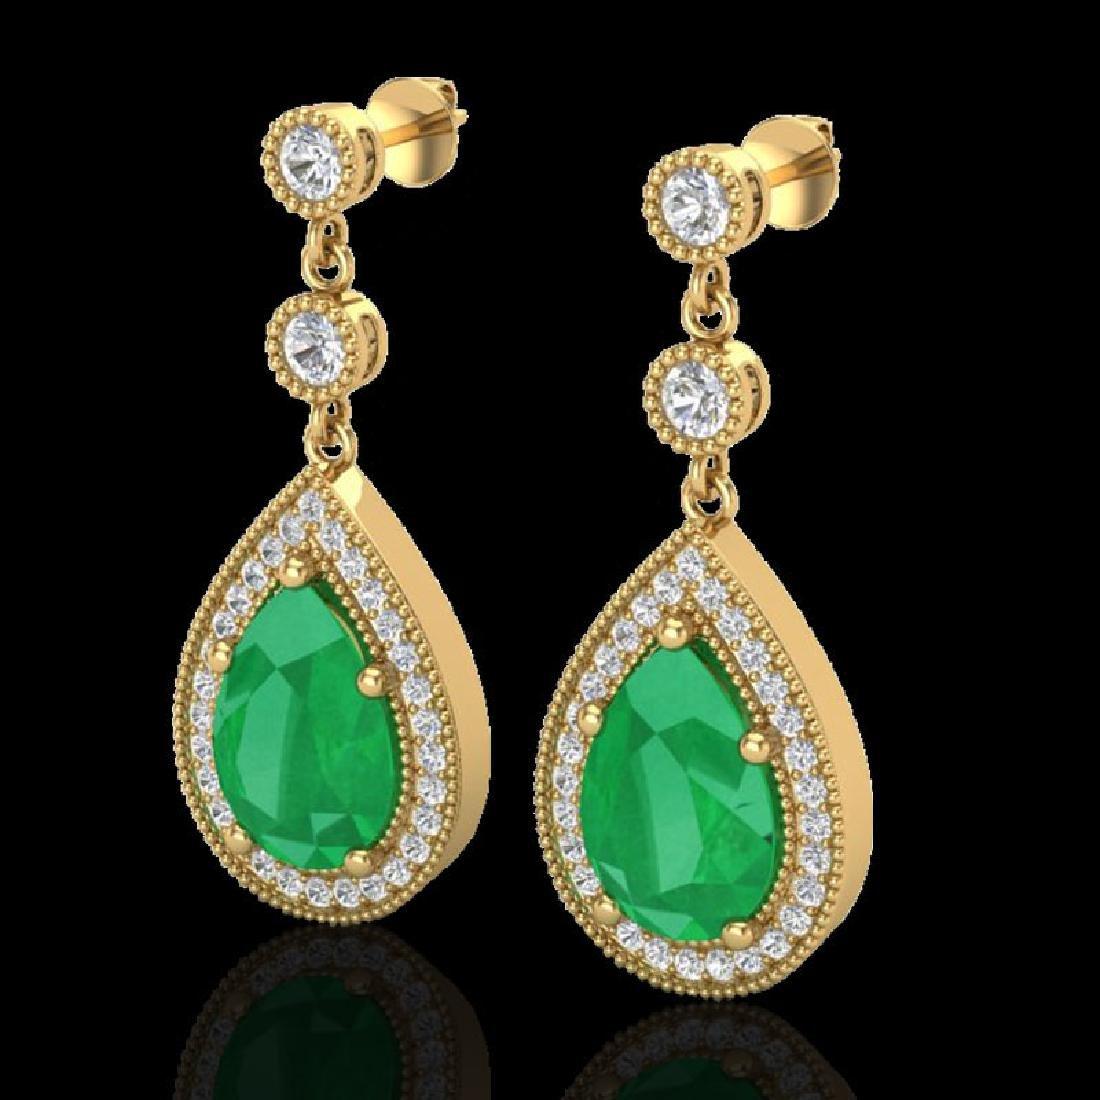 6 CTW Emerald & Micro Pave VS/SI Diamond Earrings